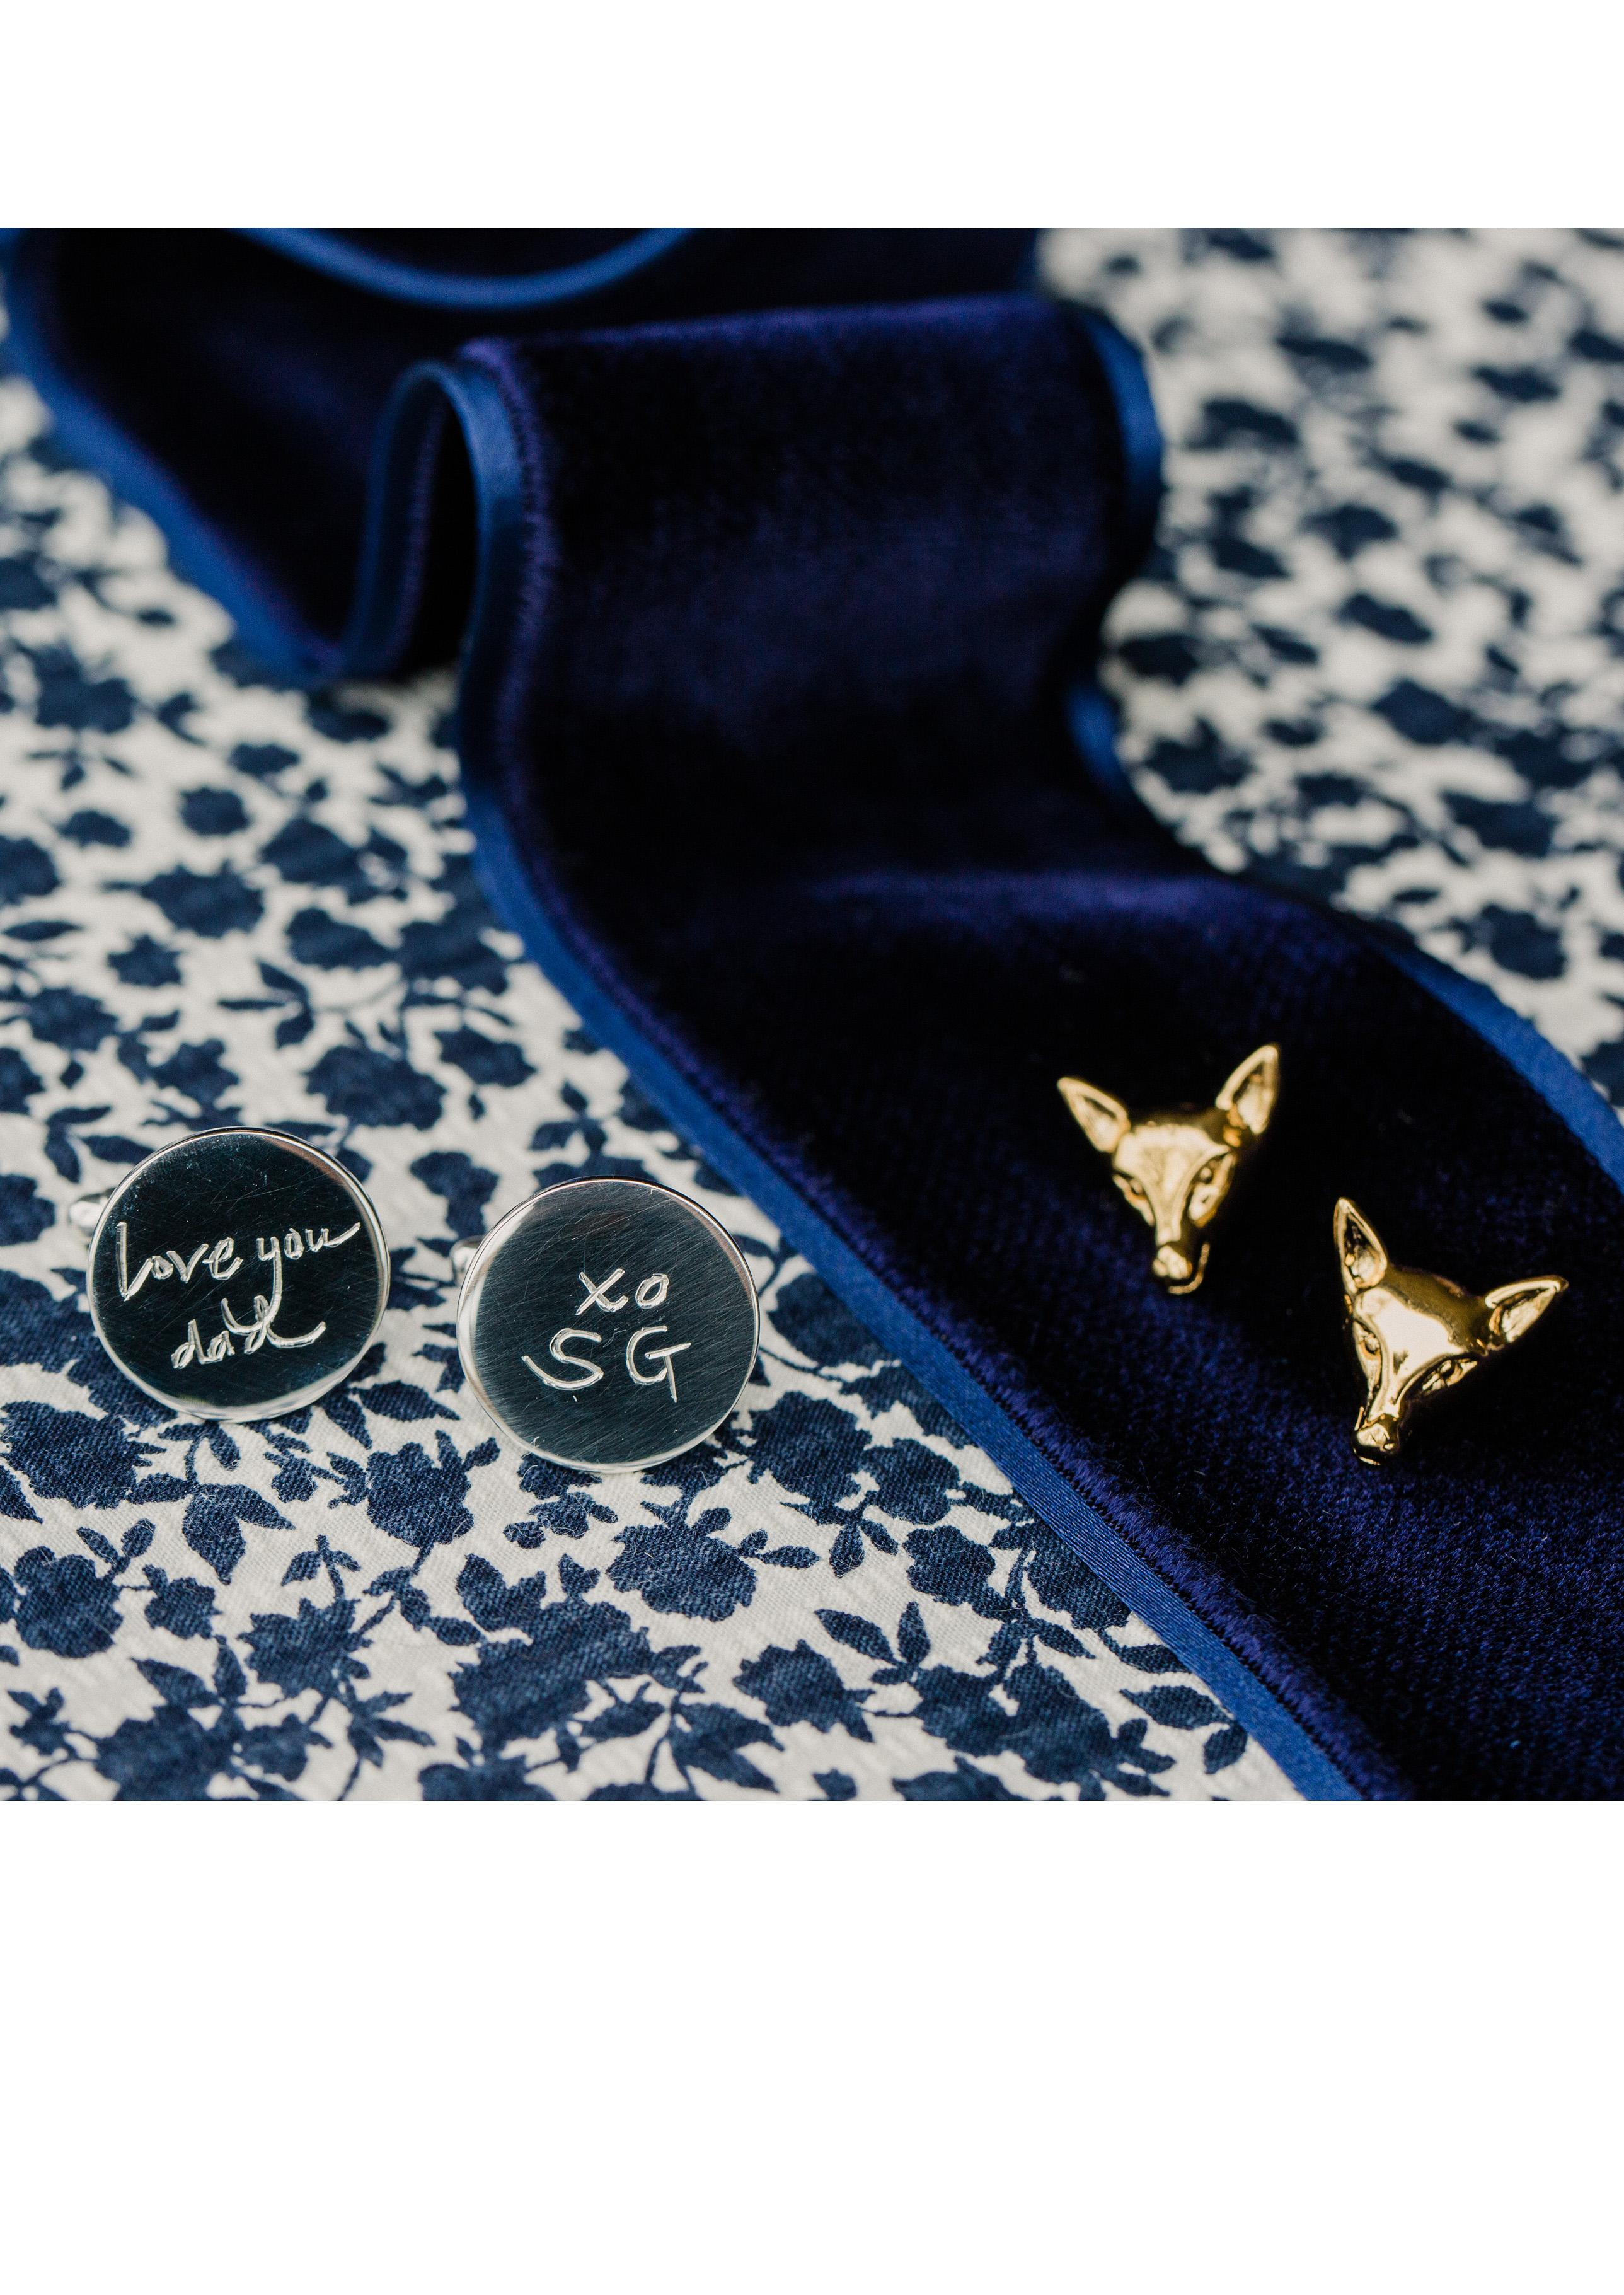 sarah greg new jersey wedding cufflinks